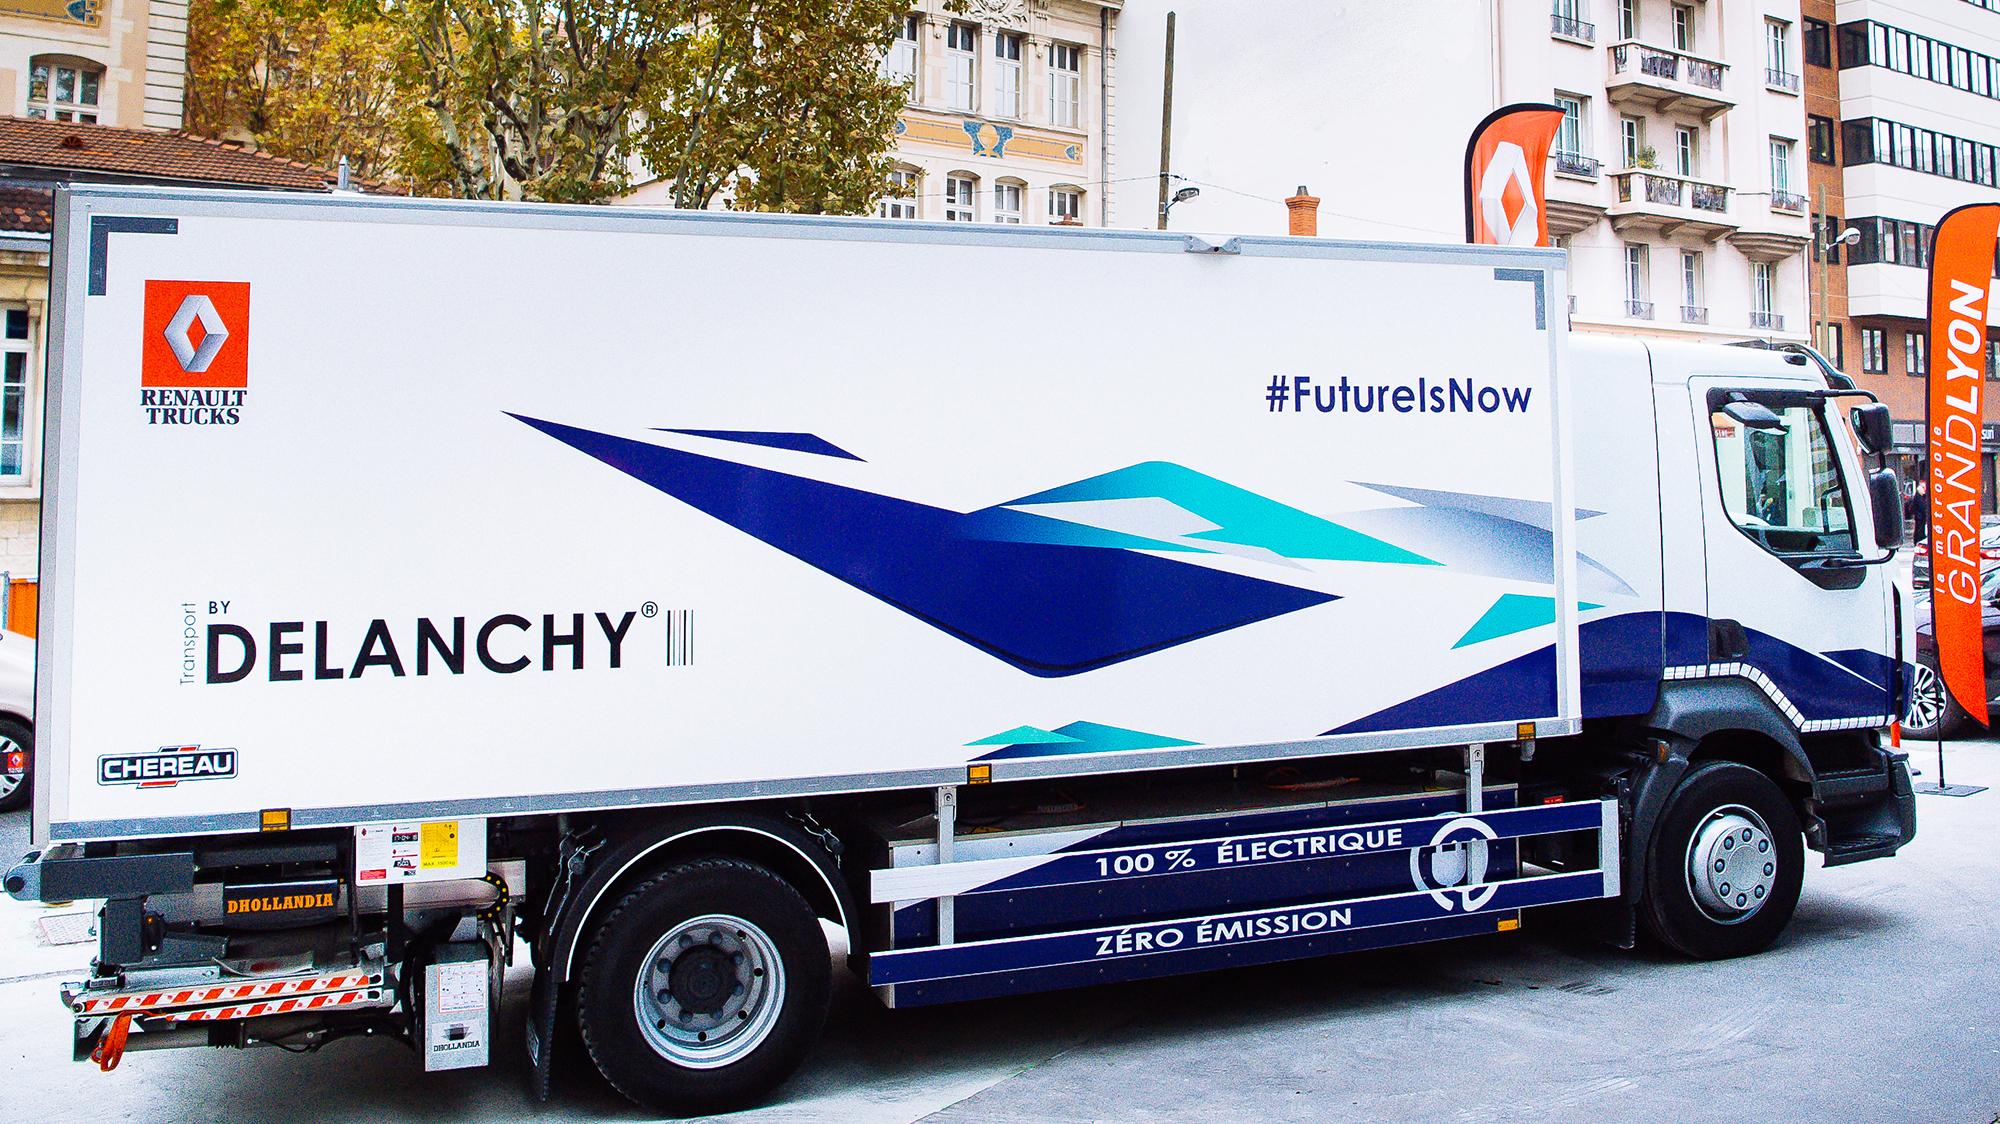 elektroautos renault trucks will ab 2019 elektro lkw in serie bauen heise online. Black Bedroom Furniture Sets. Home Design Ideas